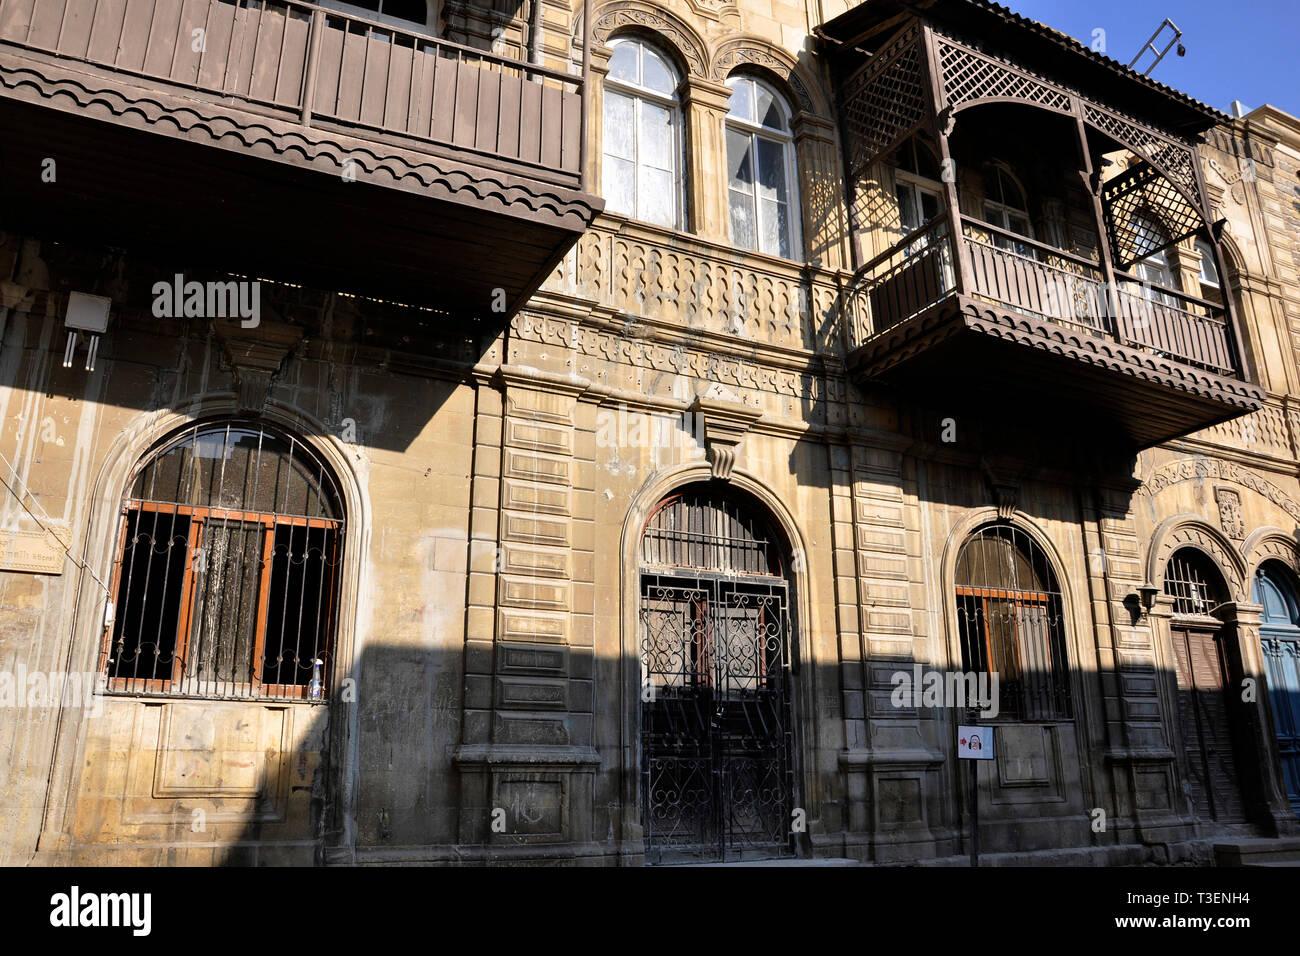 Azerbaijan, Baku, old town - Stock Image